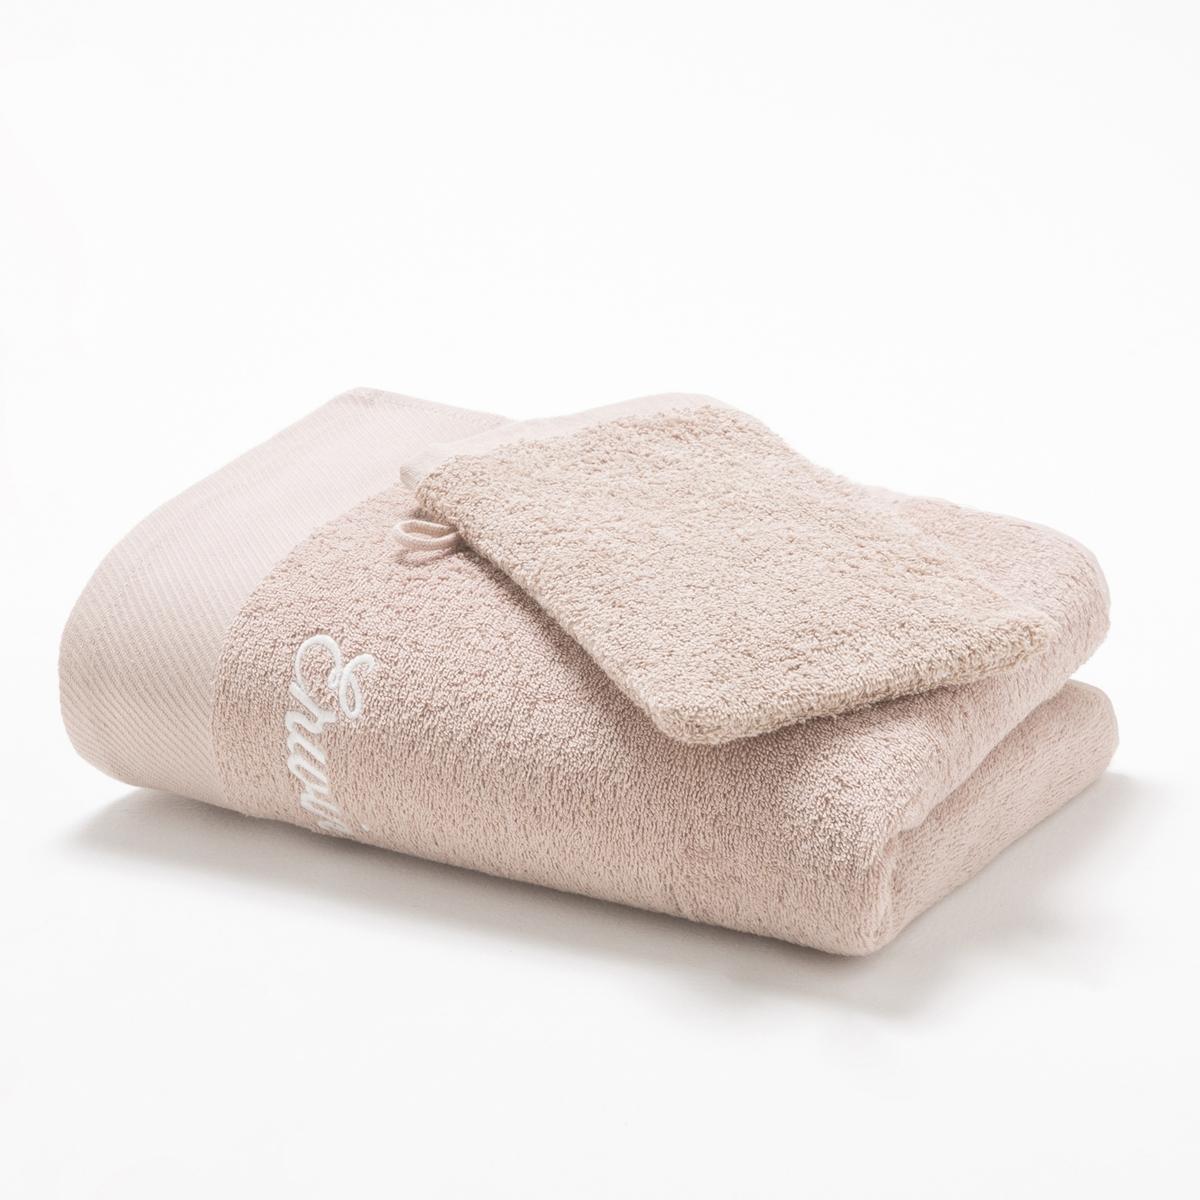 Полотенце + банная рукавичка SCENARIO, 500 г/м²